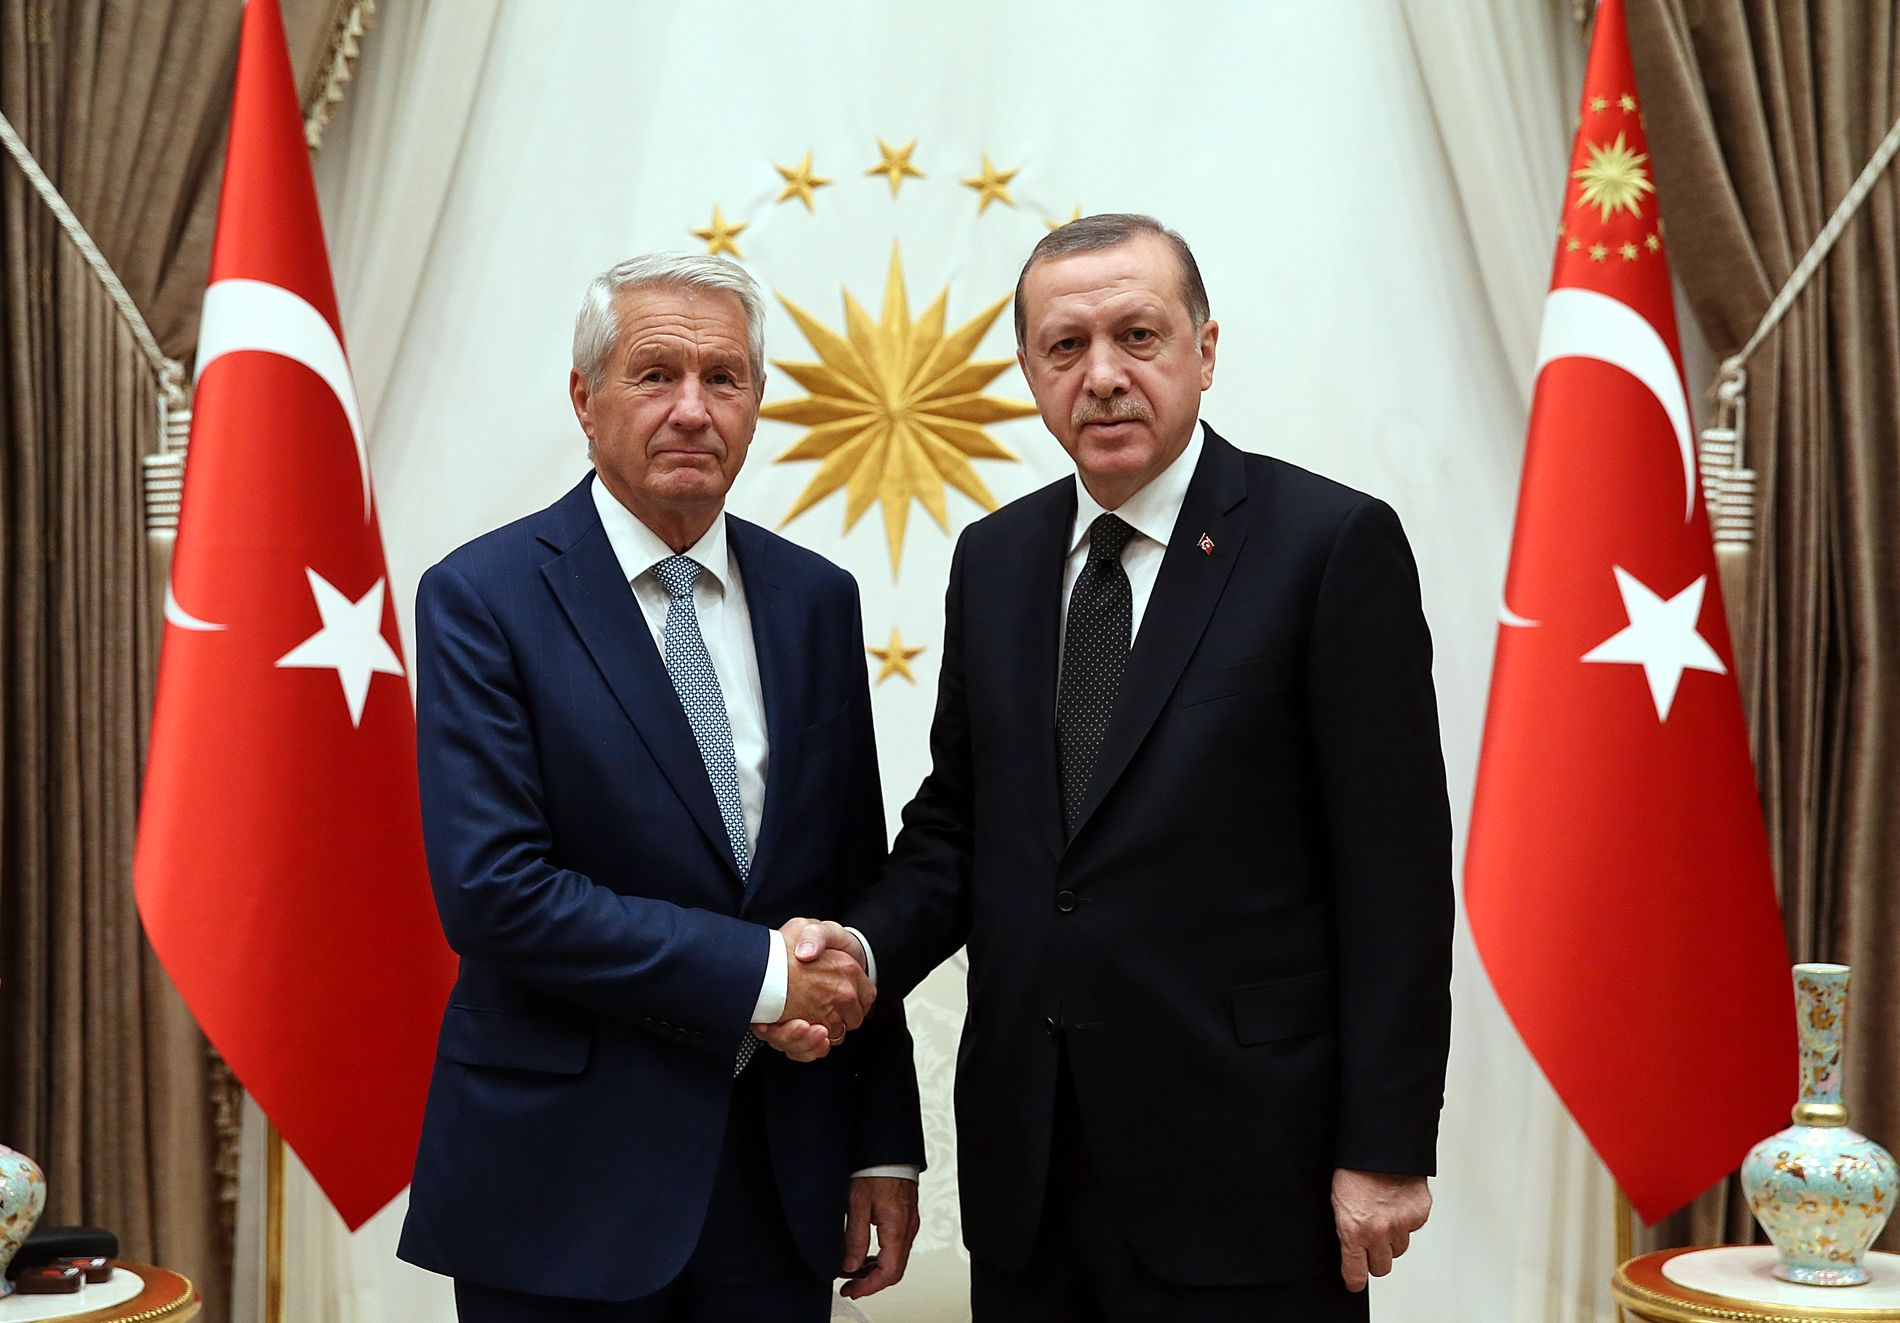 ALVORSPREGET: Europarådets generalsekretær Thorbjørn Jagland og Tyrkias president Recep Tayyip Erdogan under et møte i Ankara i november i fjor.